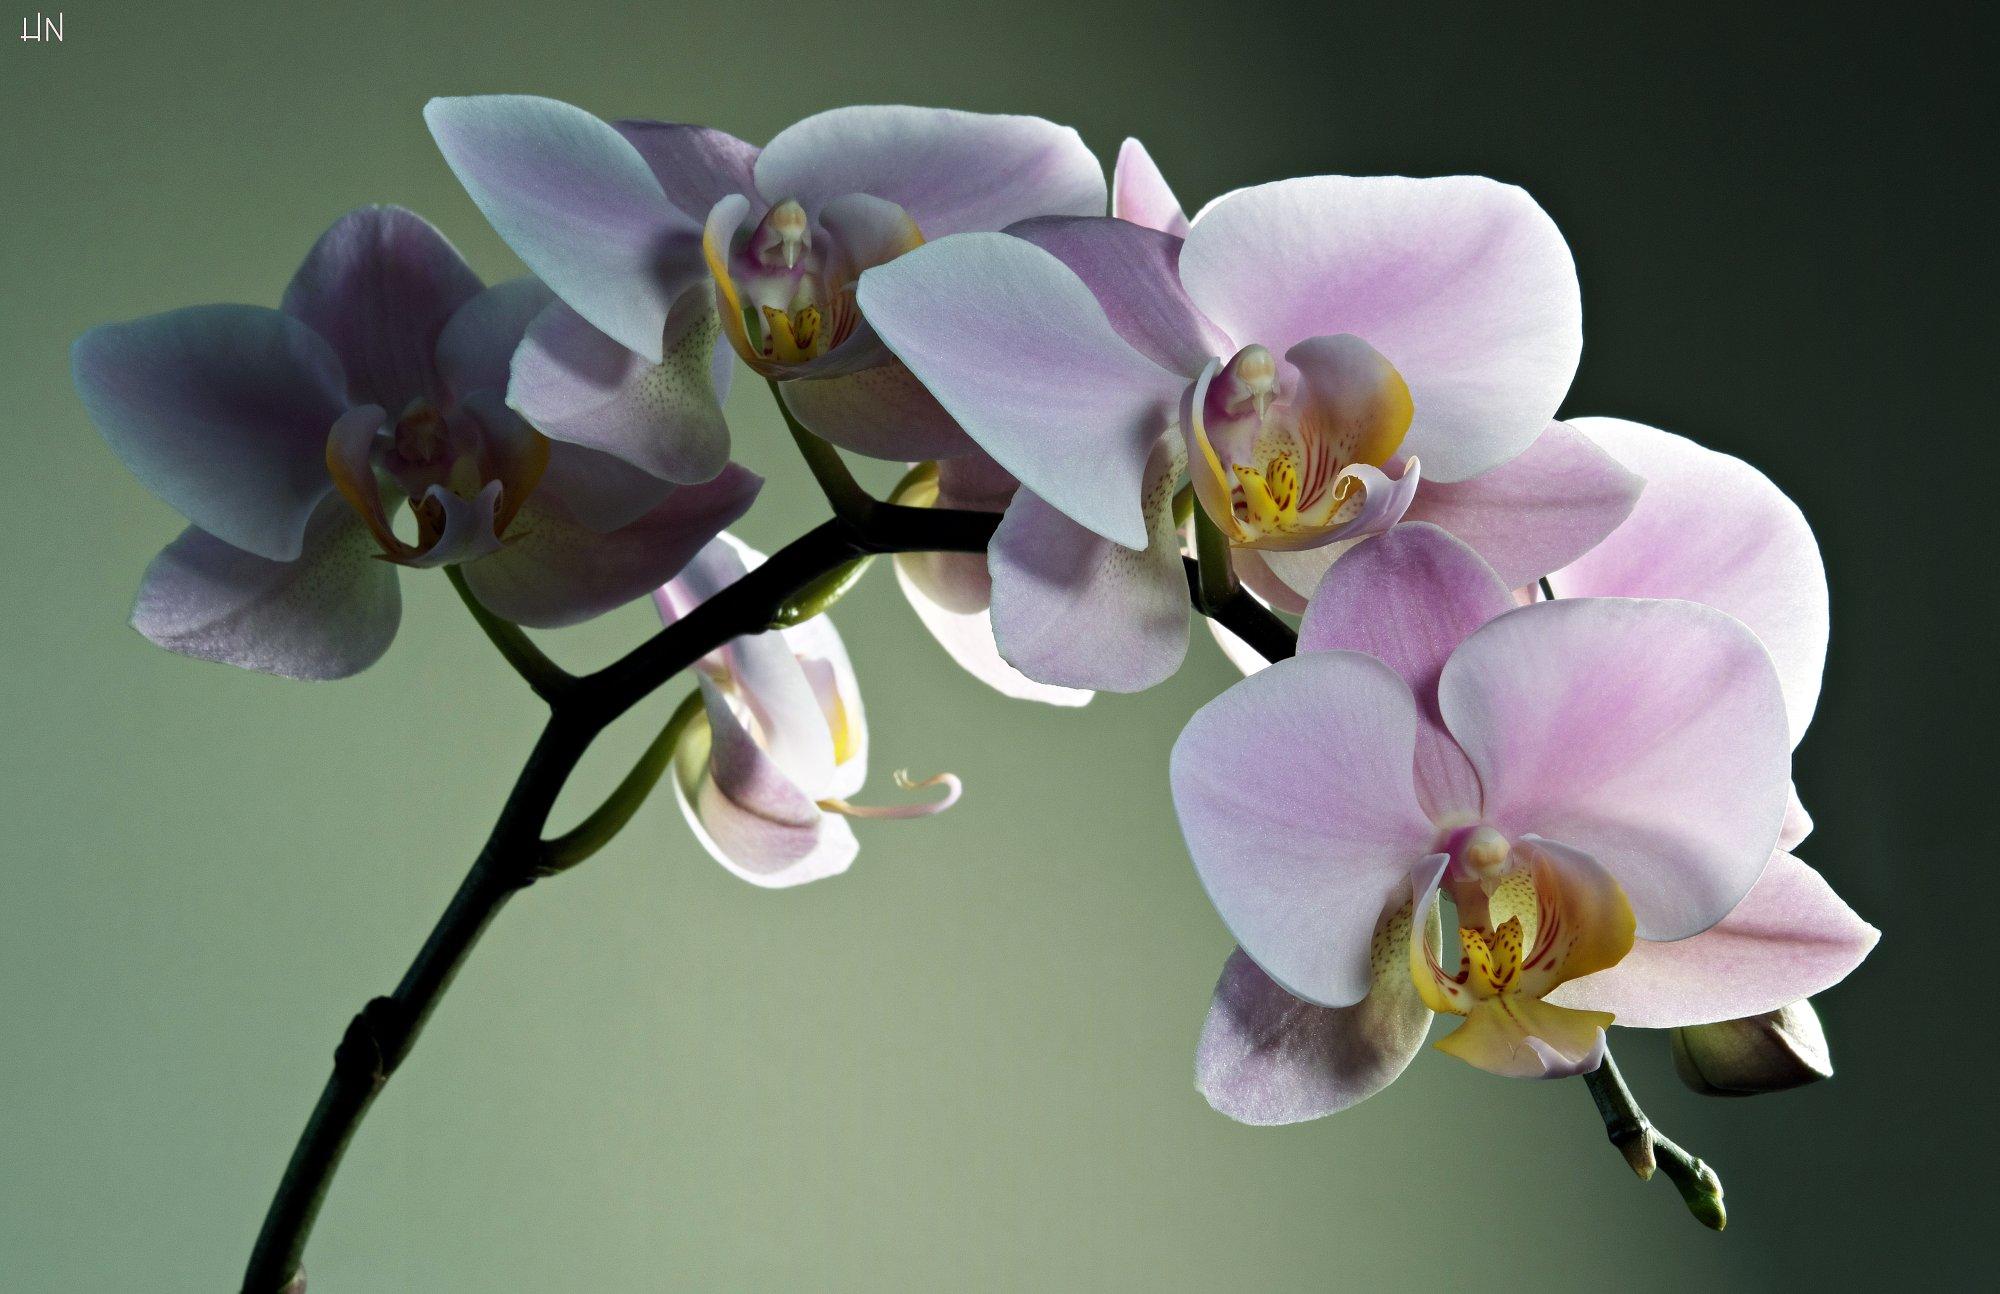 (Yin Yang) Orchid